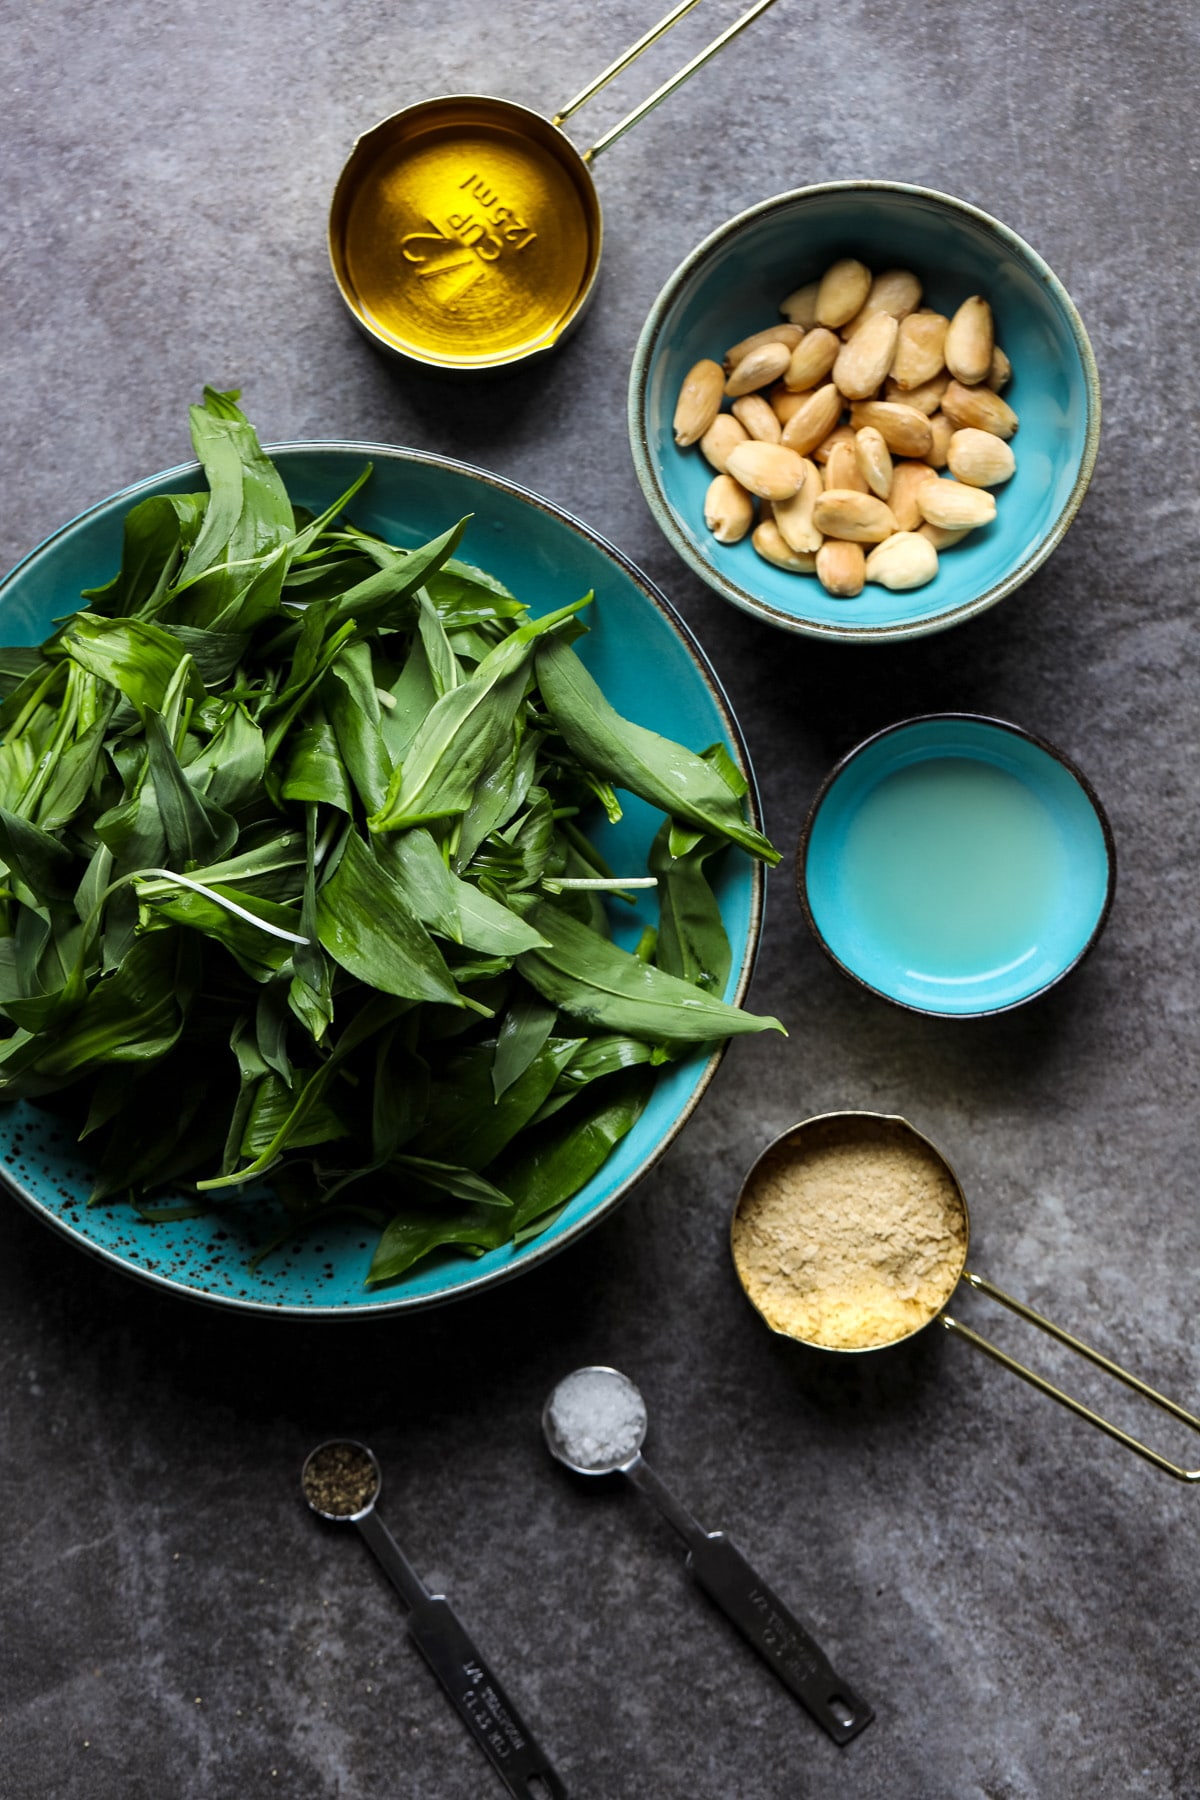 Ingredients for Wild Garlic Pesto.